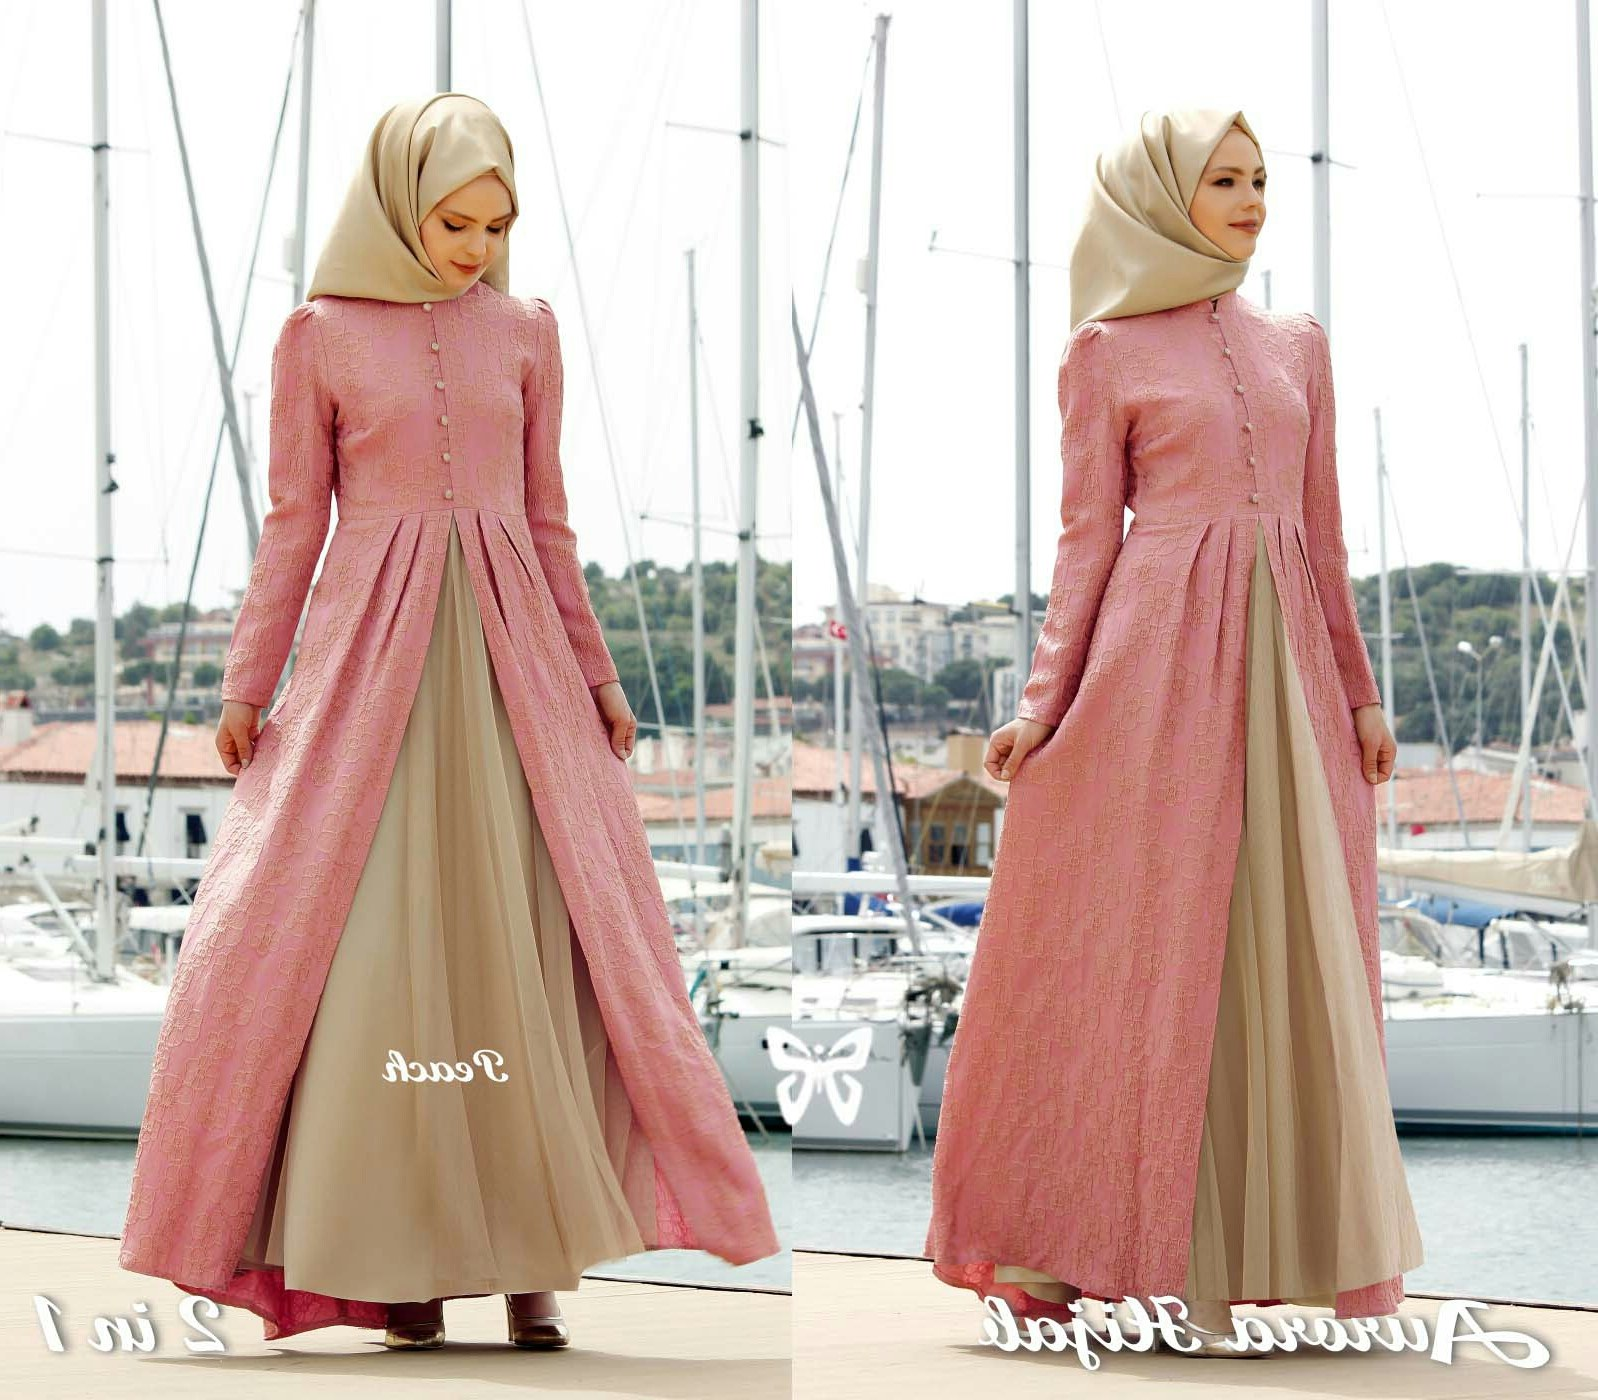 Ide Fashion Muslim Terbaru Wddj Model Gamis Baju Muslim Fashion Hijab Terbaru Setelan